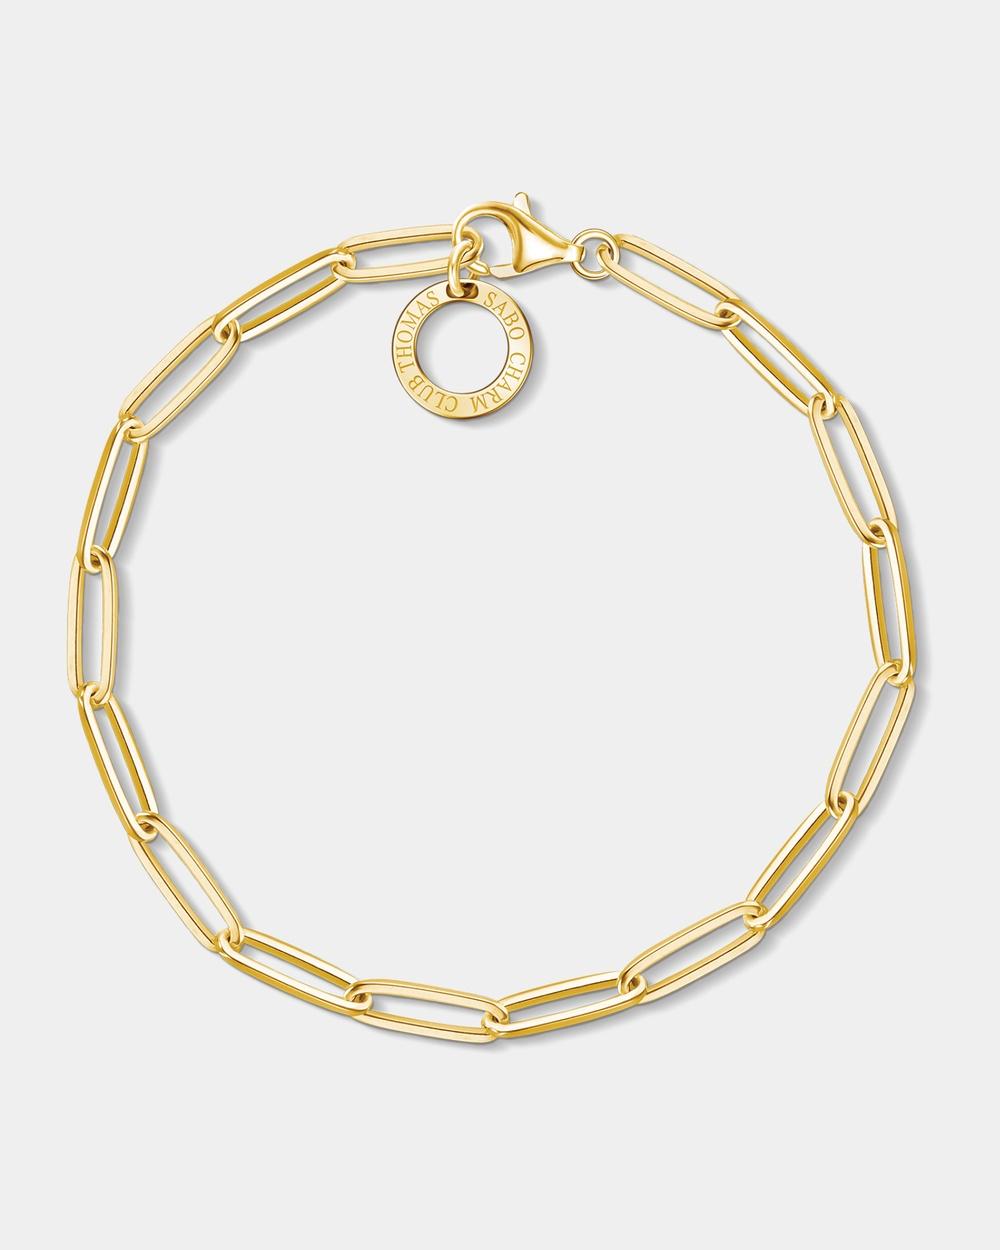 THOMAS SABO Yellow Gold Plated Long Link Bracelet Jewellery Yellow